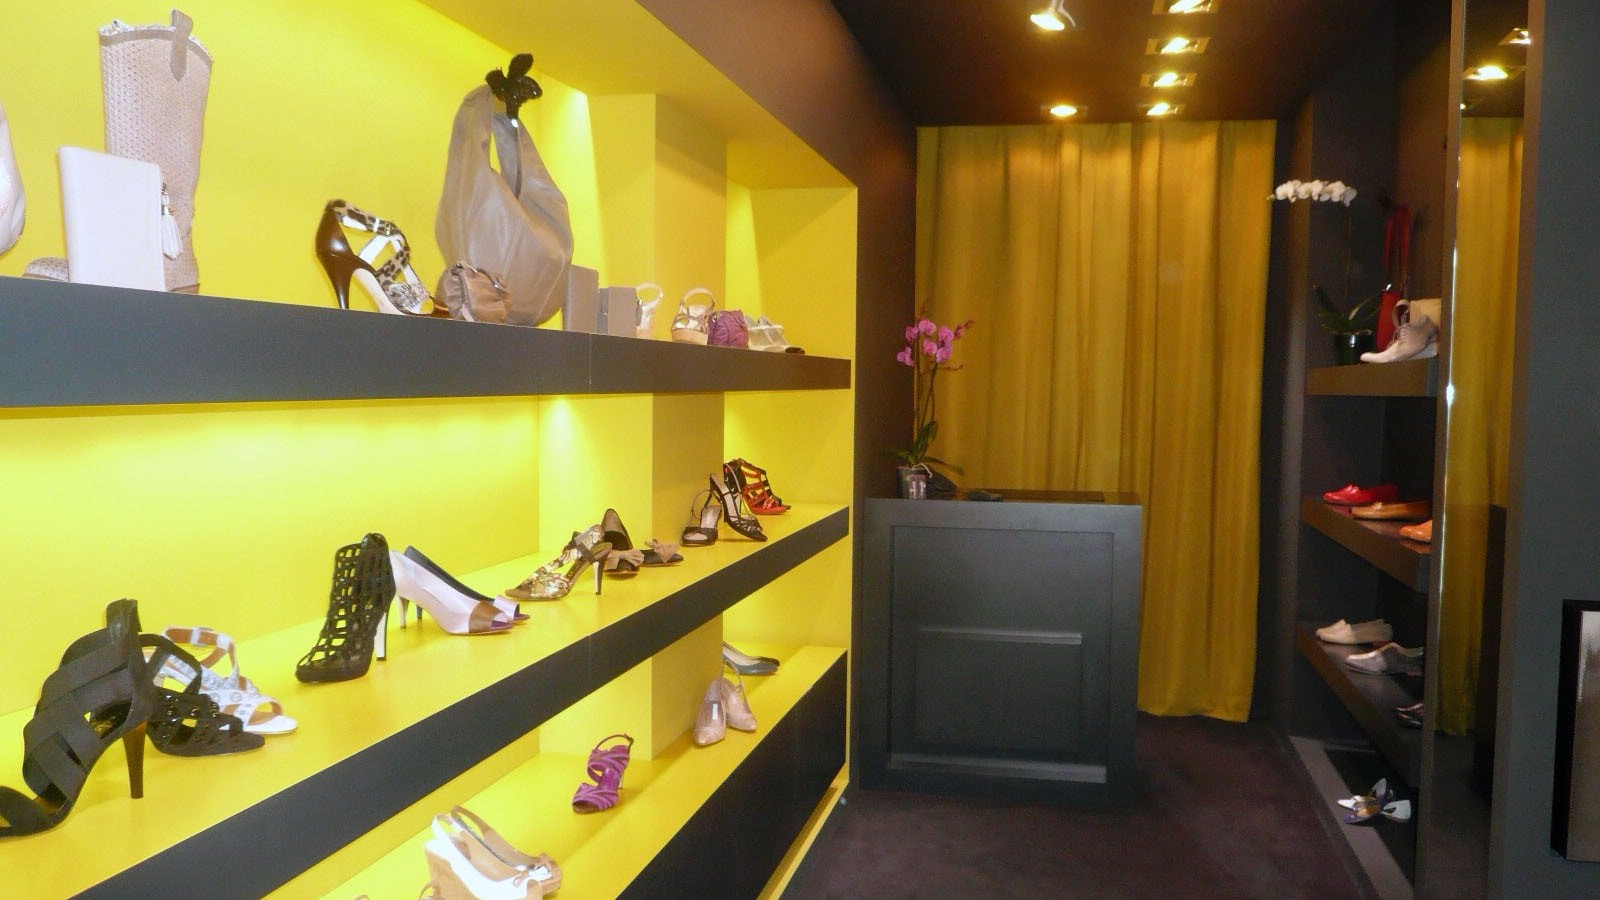 Boutique Escalona Paris Efi Design (2)